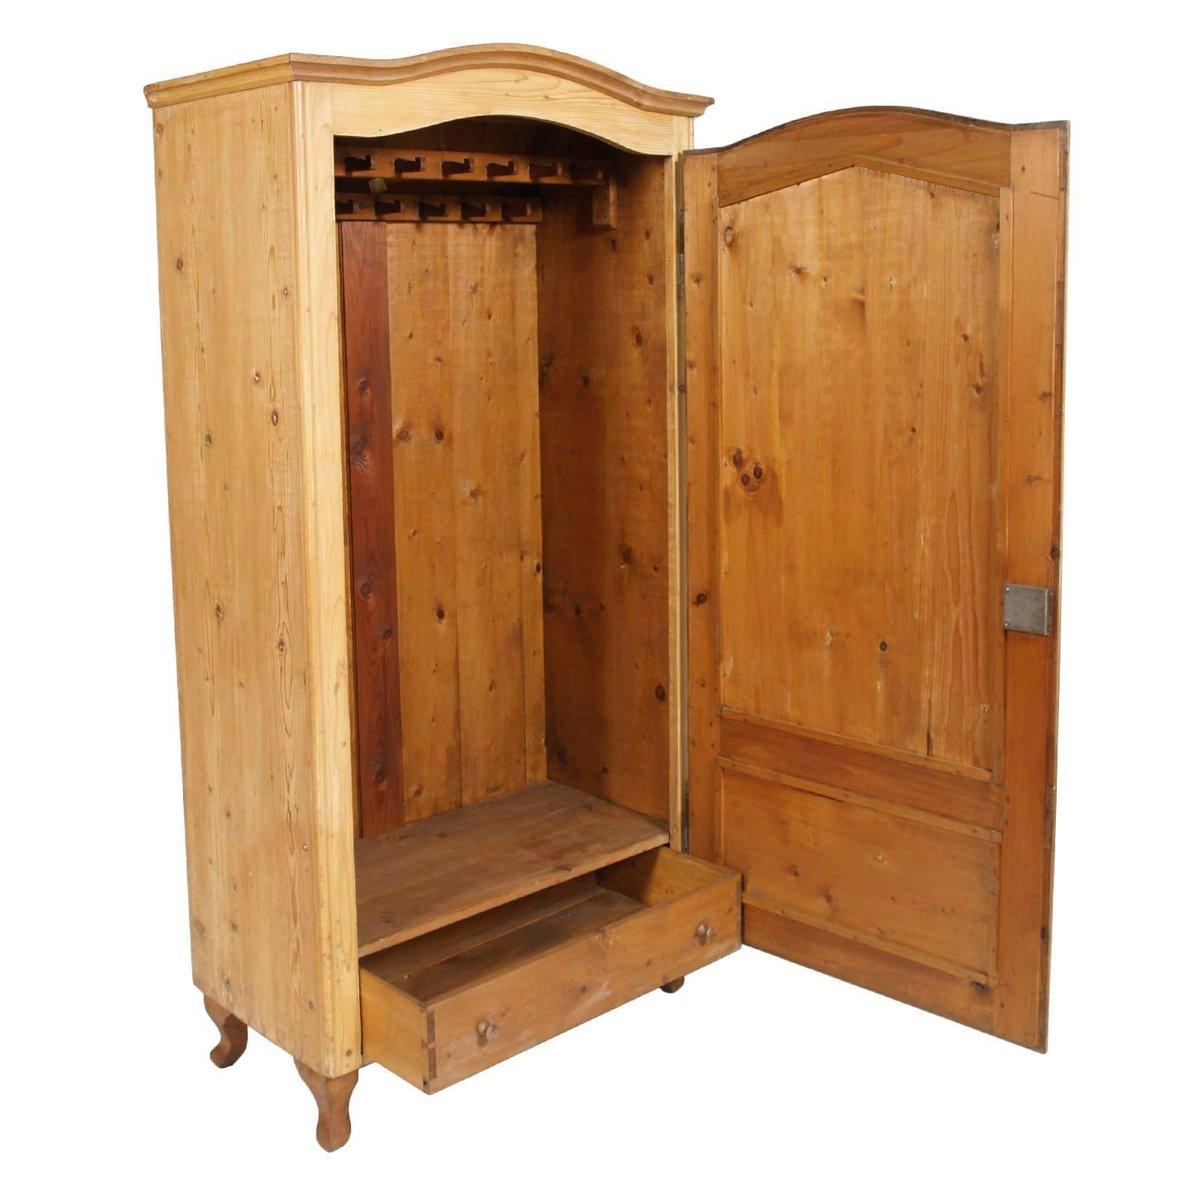 garderobe aus holz 19 jh bei pamono kaufen. Black Bedroom Furniture Sets. Home Design Ideas